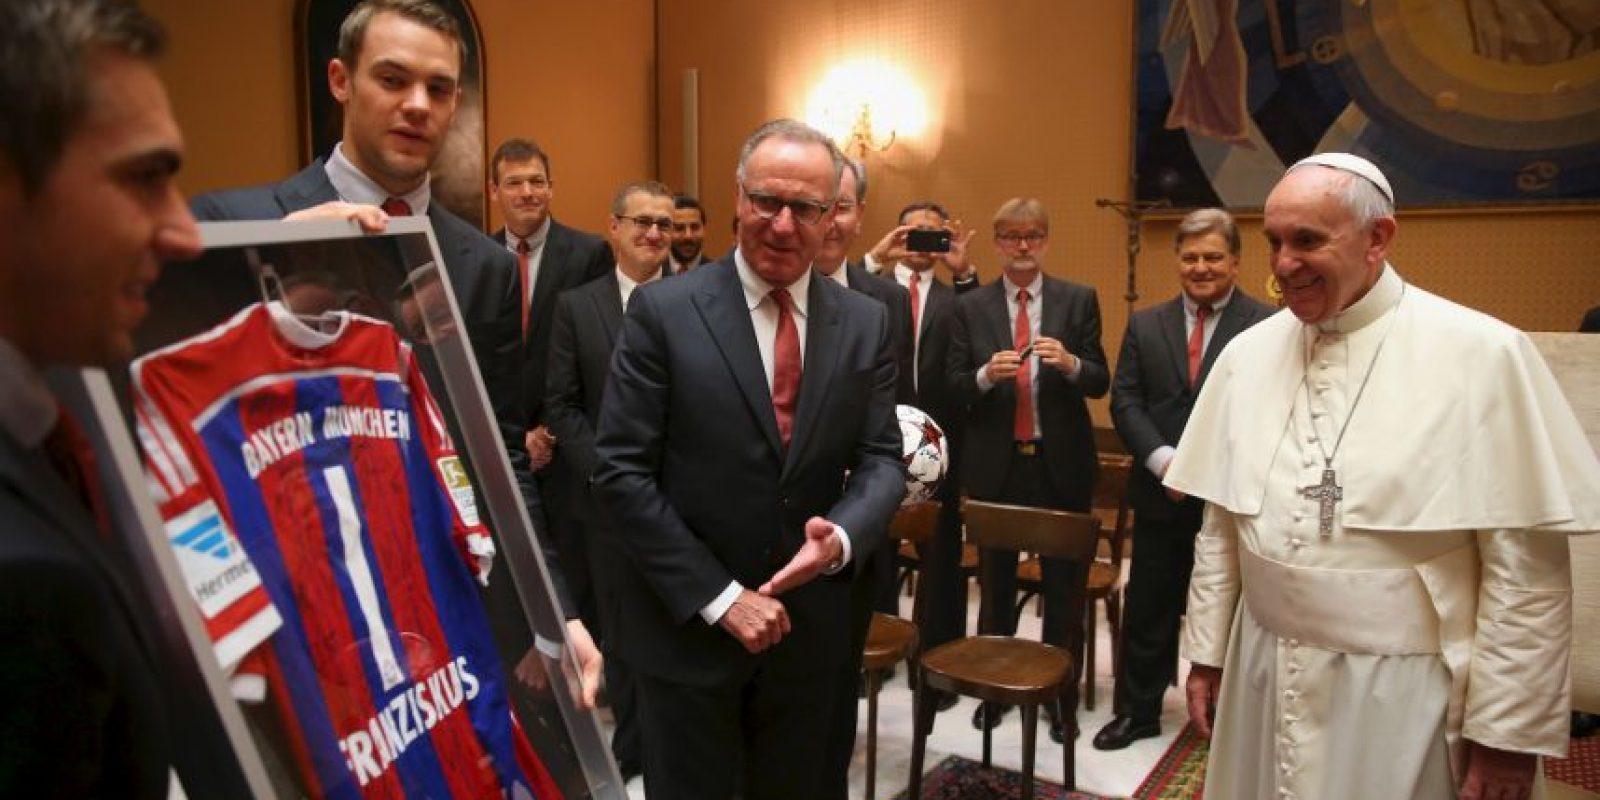 Jugadores del Baten Munich le regalan una camiseta autografiada al Pontífice Foto:Getty Images